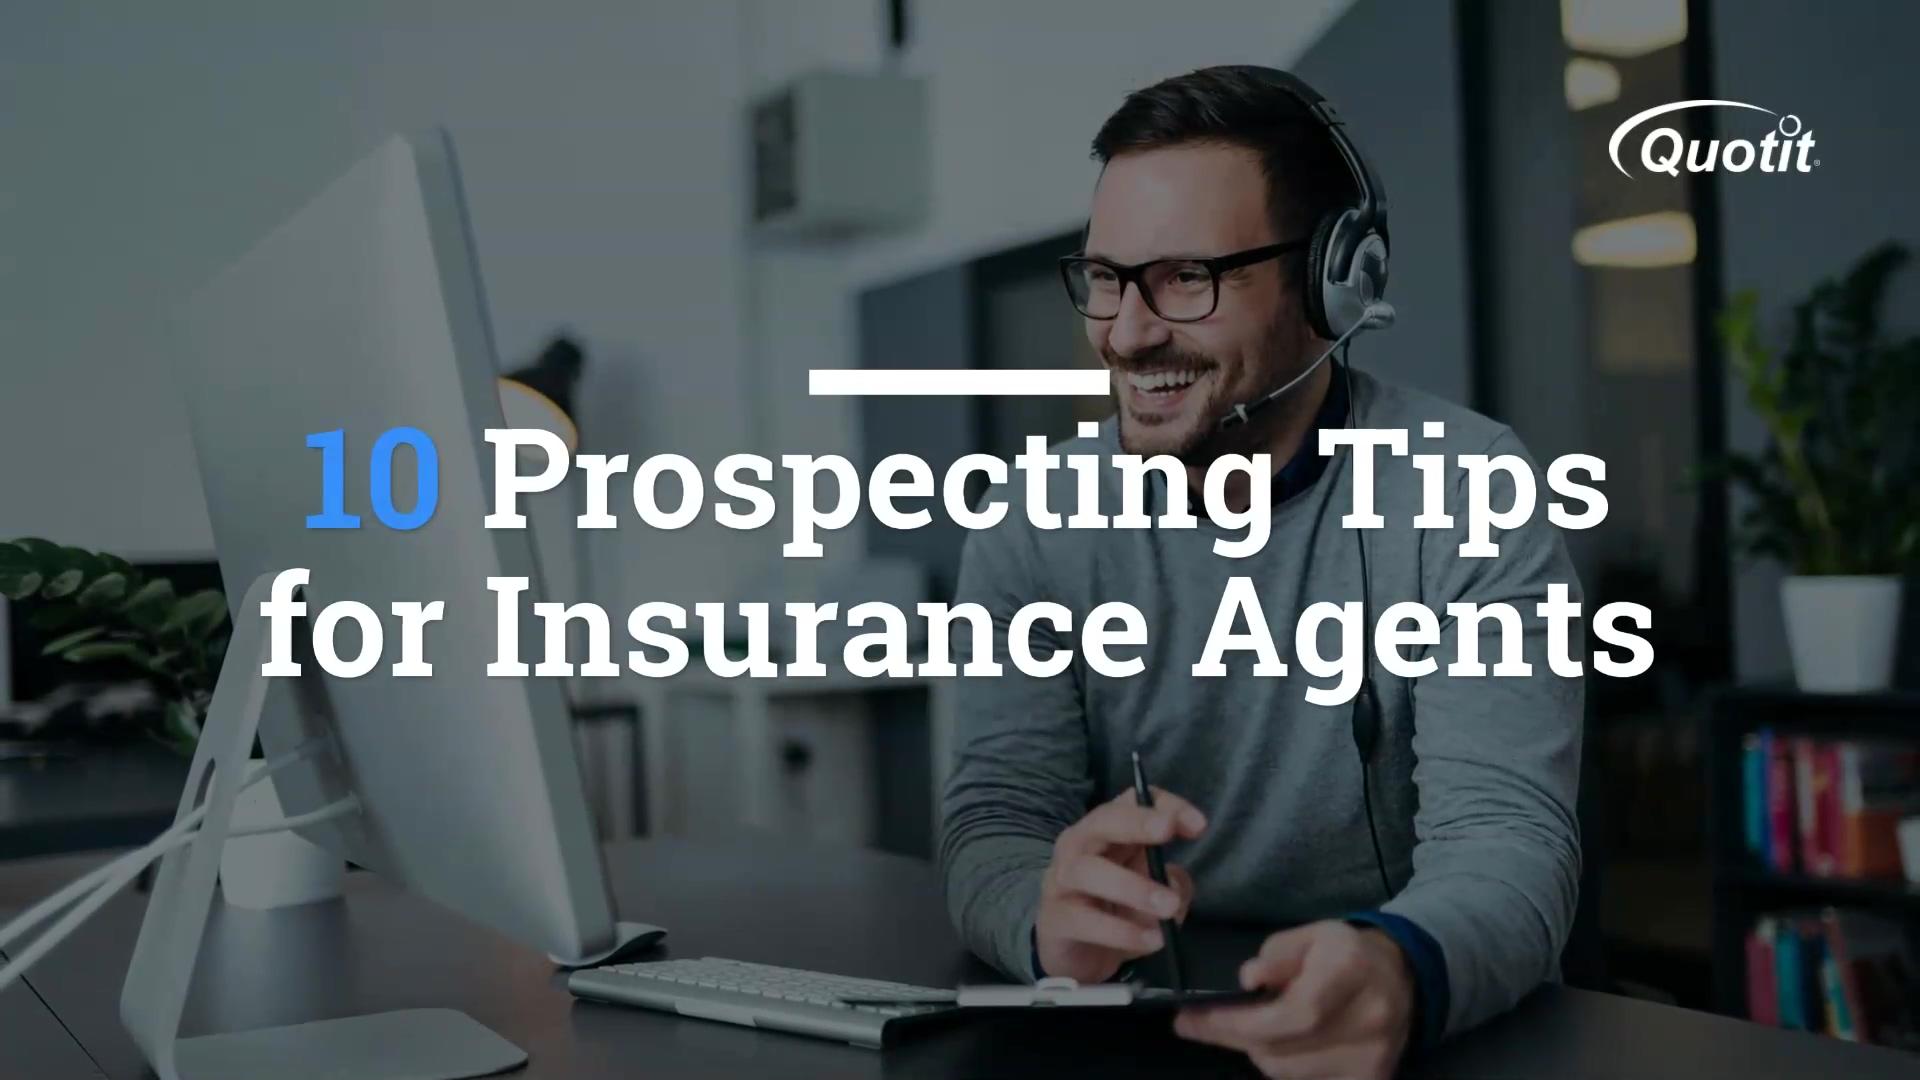 10_Prospecting_Tips (1)